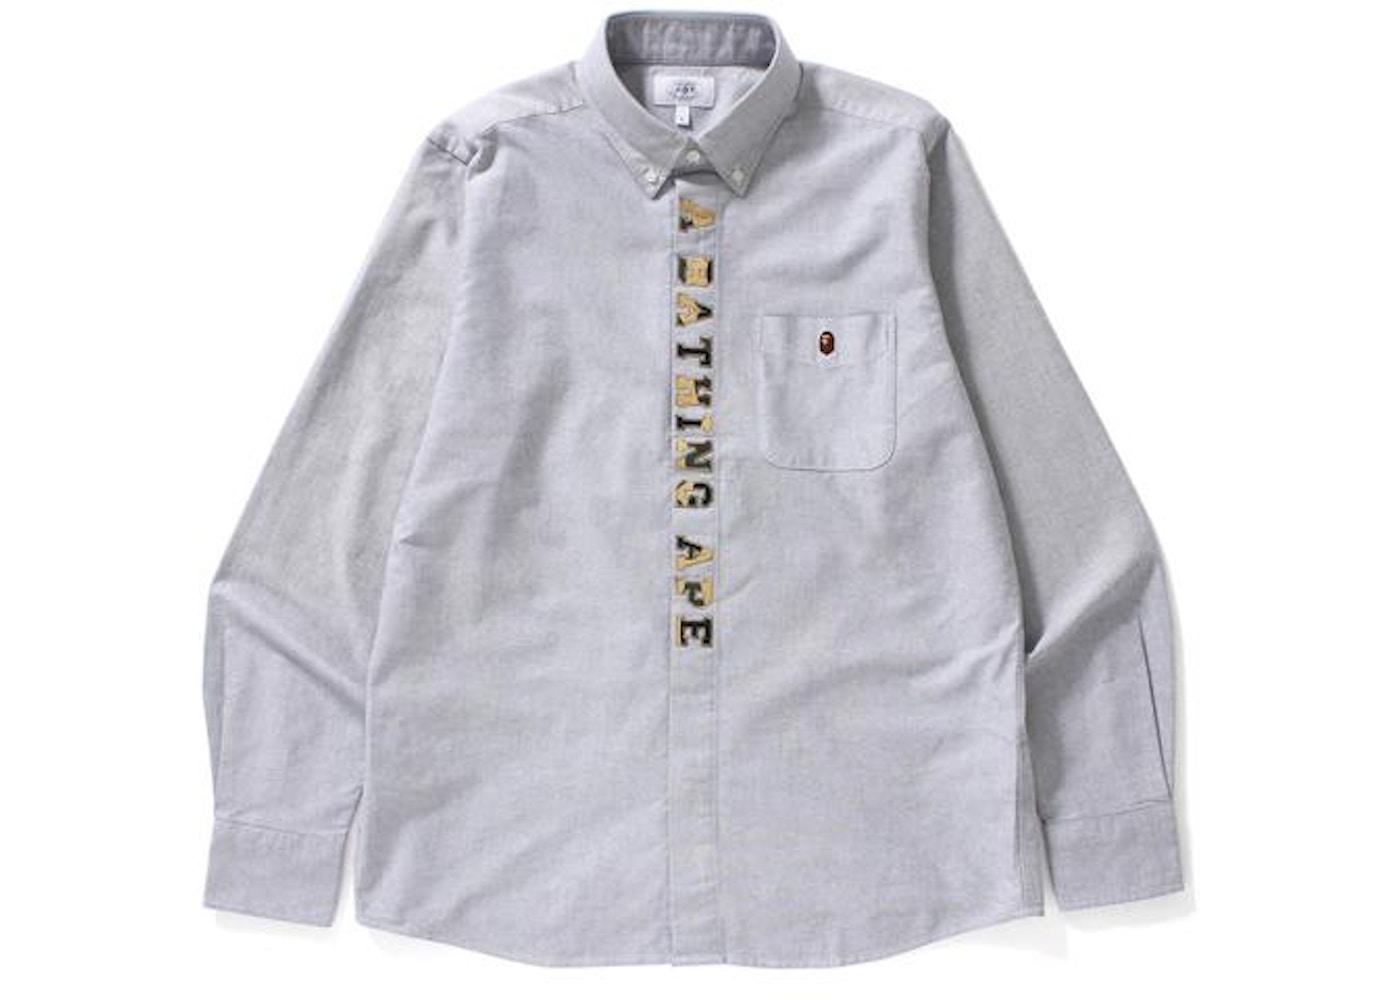 b2483a18 BAPE 1st Camo Applique Oxford Bd Shirt Shirt Gray/Yellow -